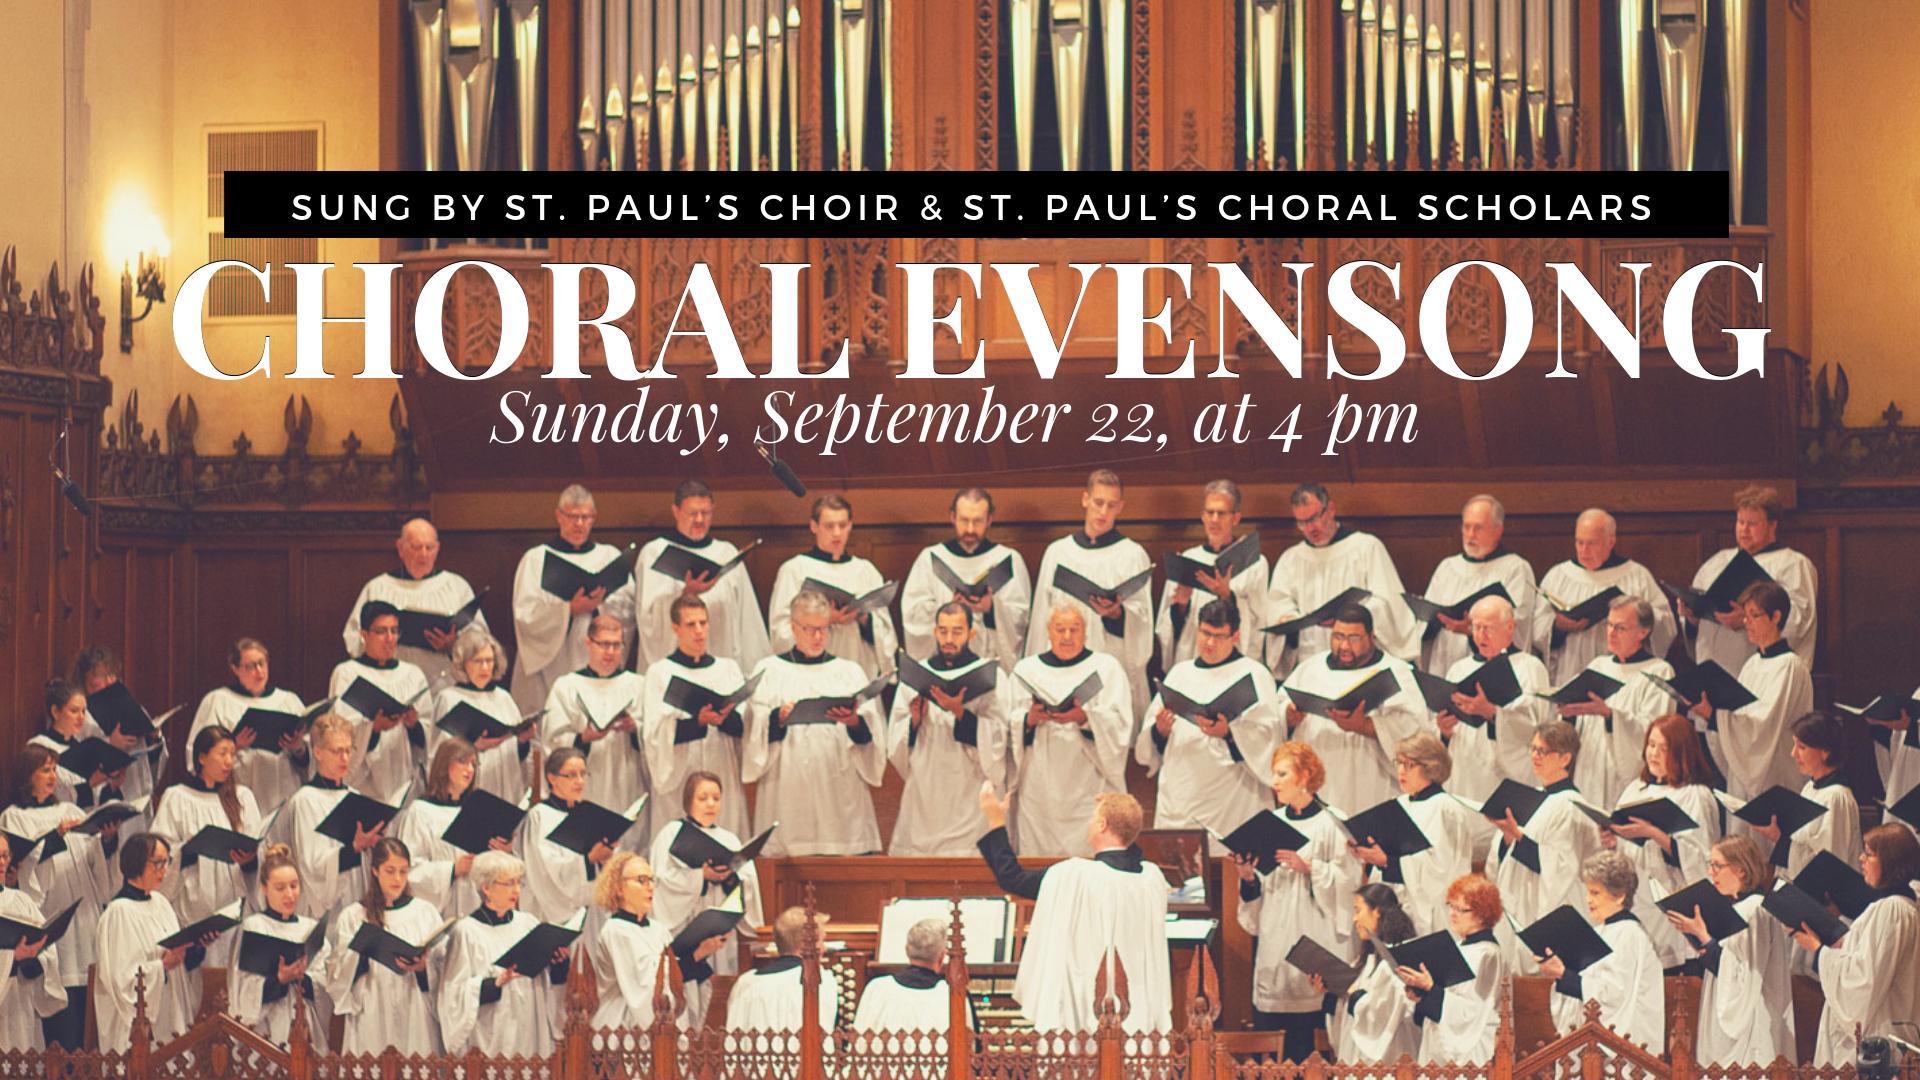 16x9 Choral Evensong - Sept. 22, 2019 - no @.jpg